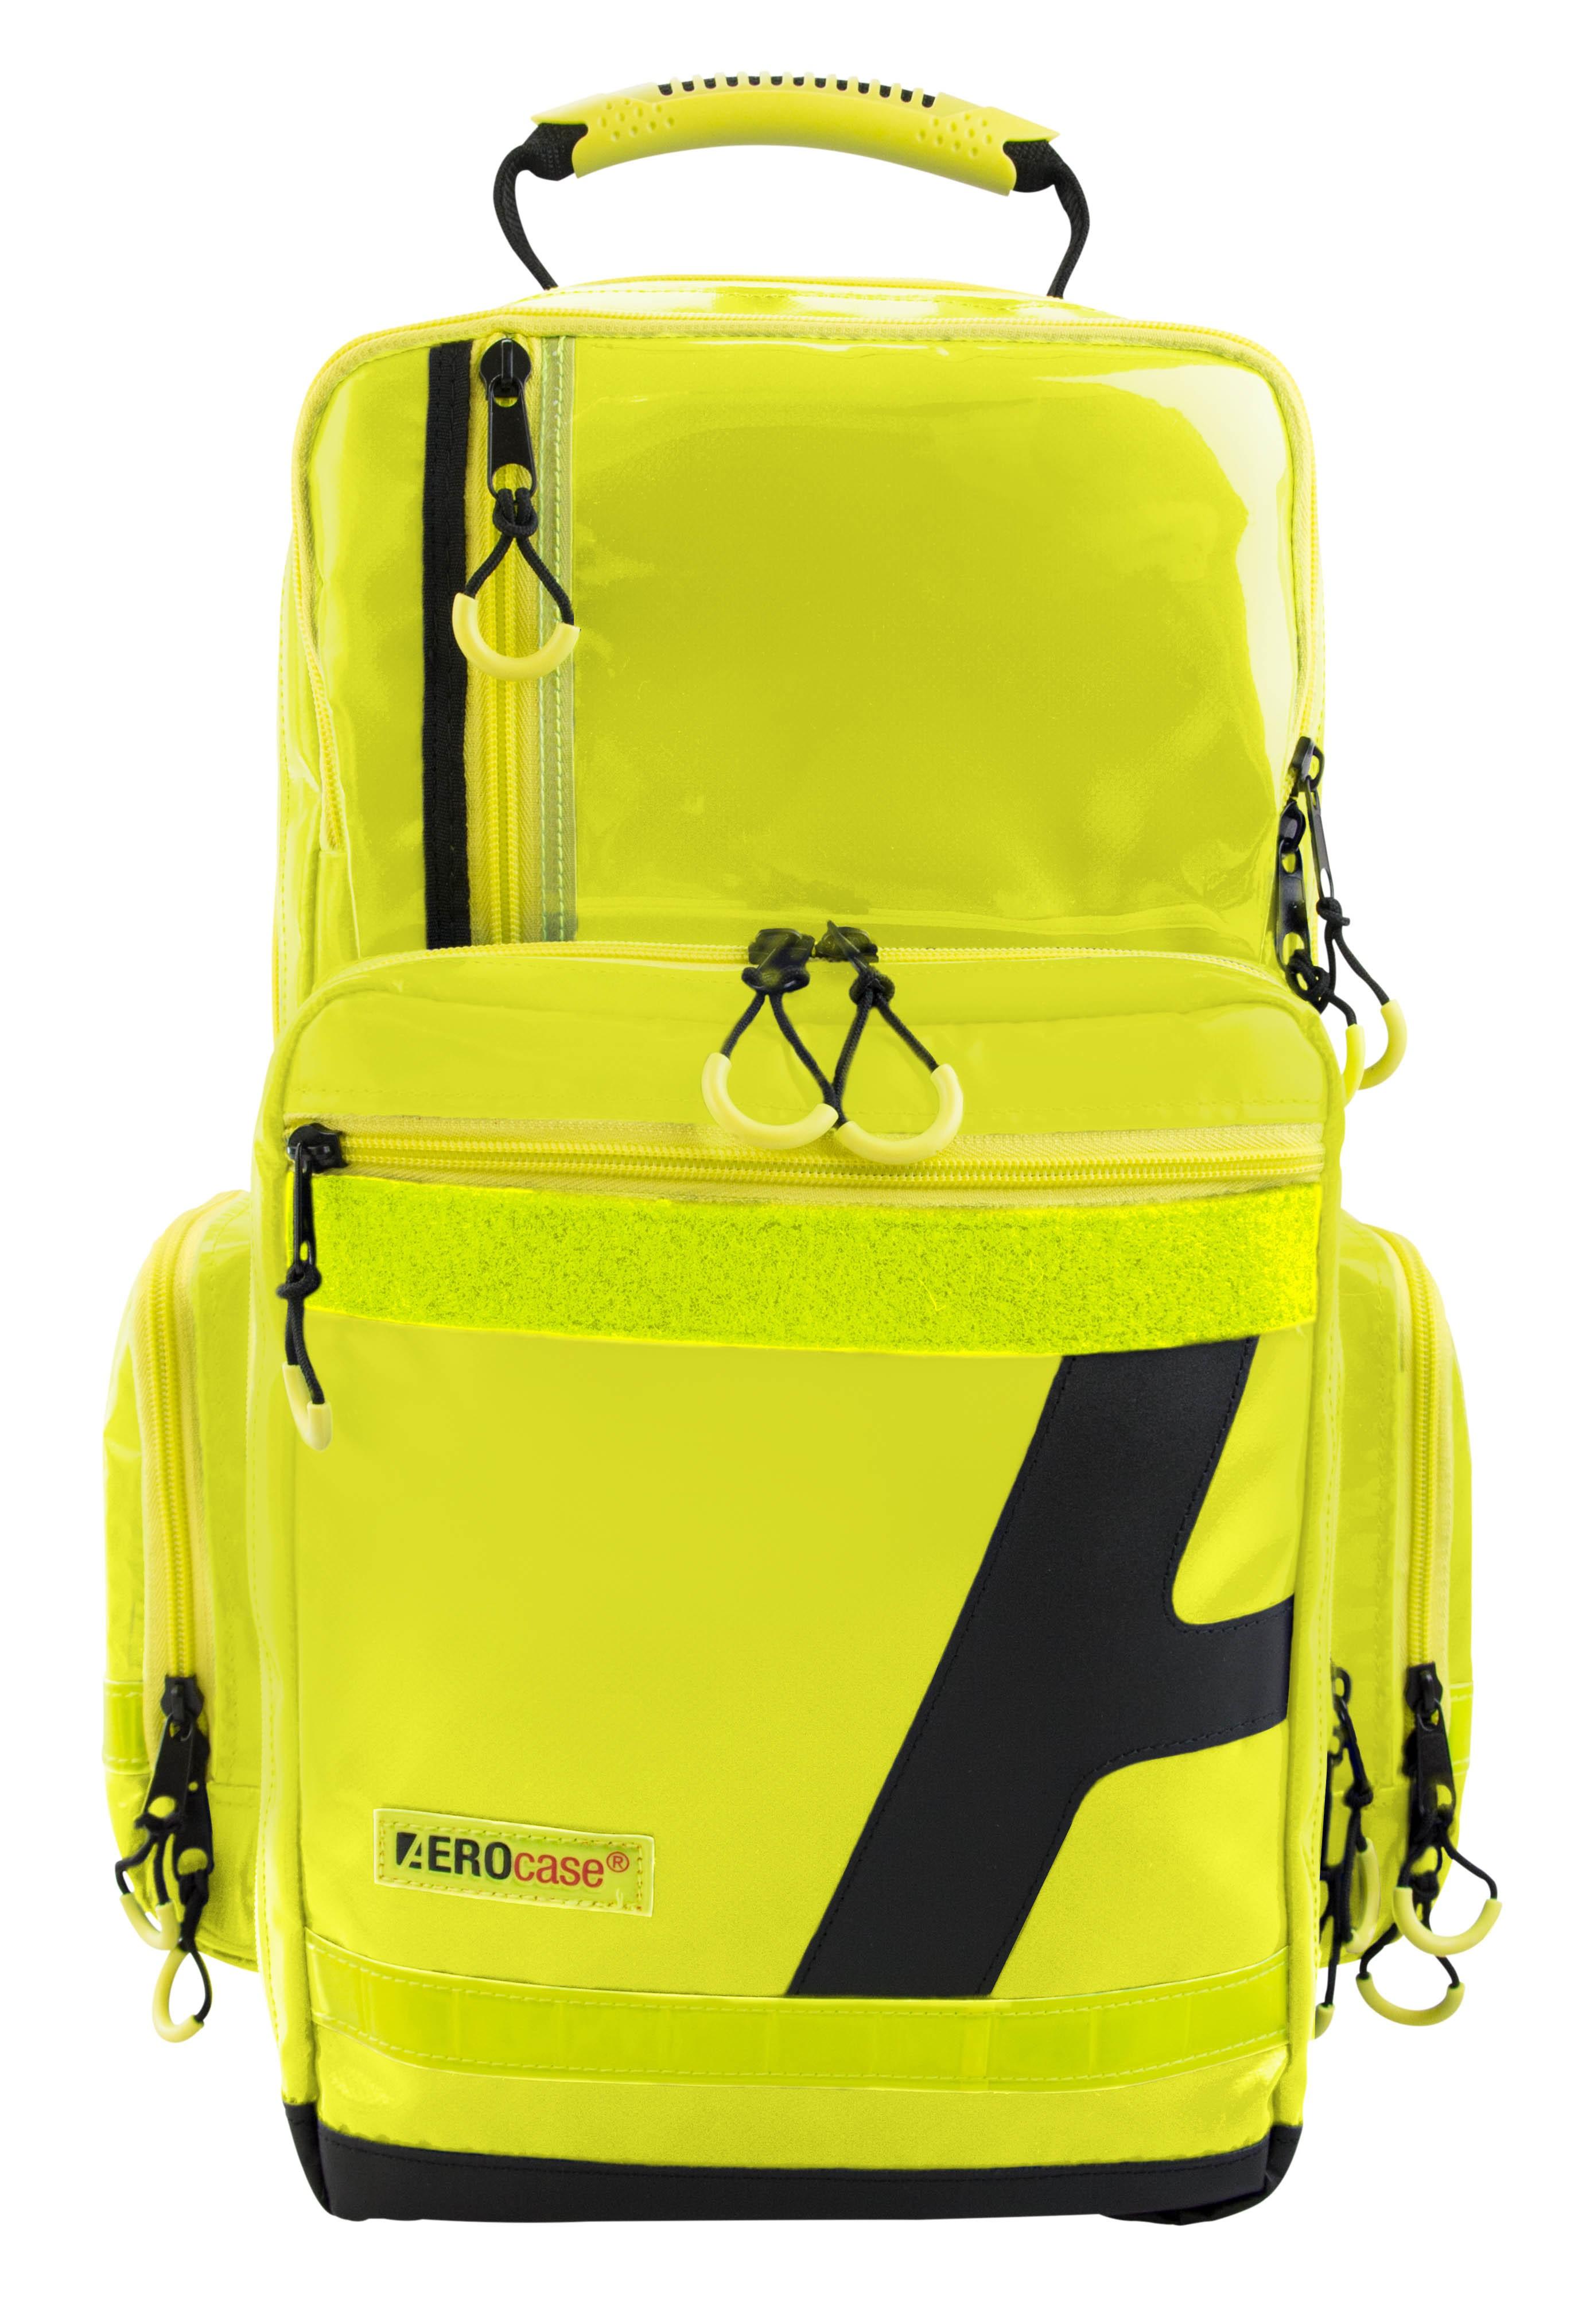 AEROcase® Notfallrucksack Large Plane in gelb